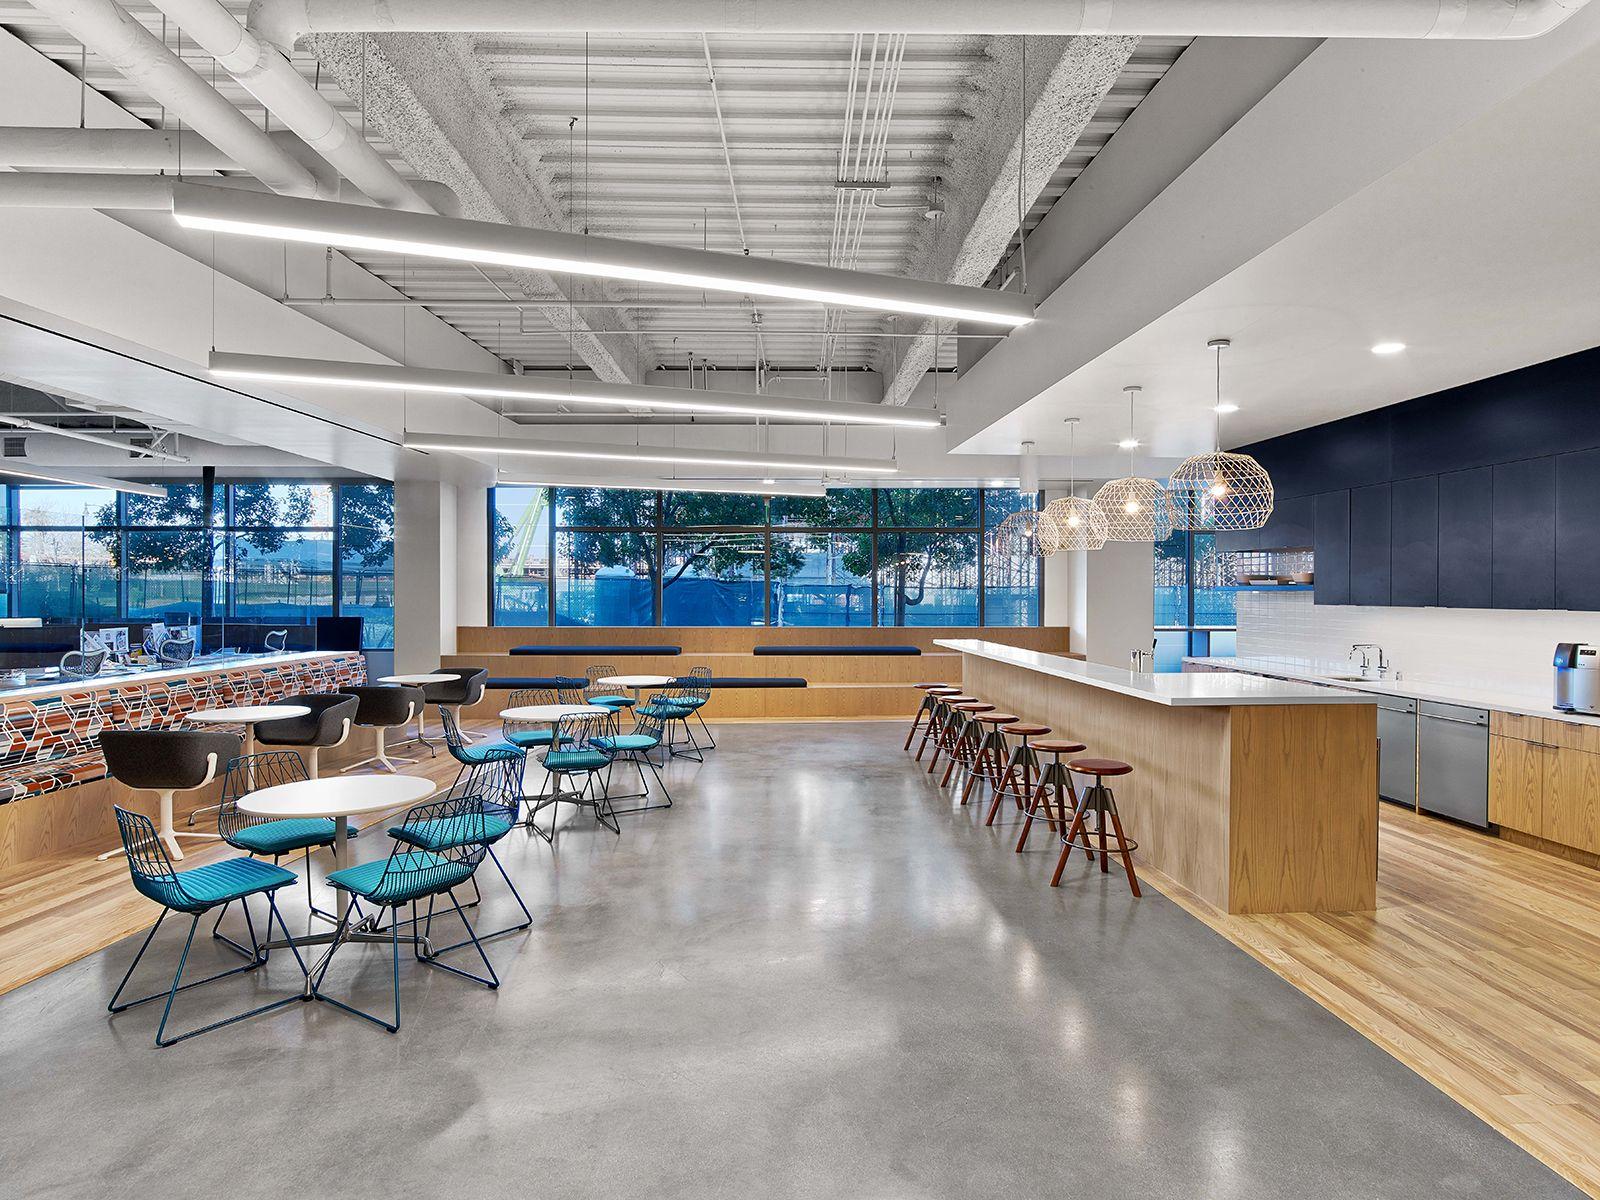 A Tour Of Fullscreenu0027s Los Angeles Headquarters   Phase 2   Officelovinu0027